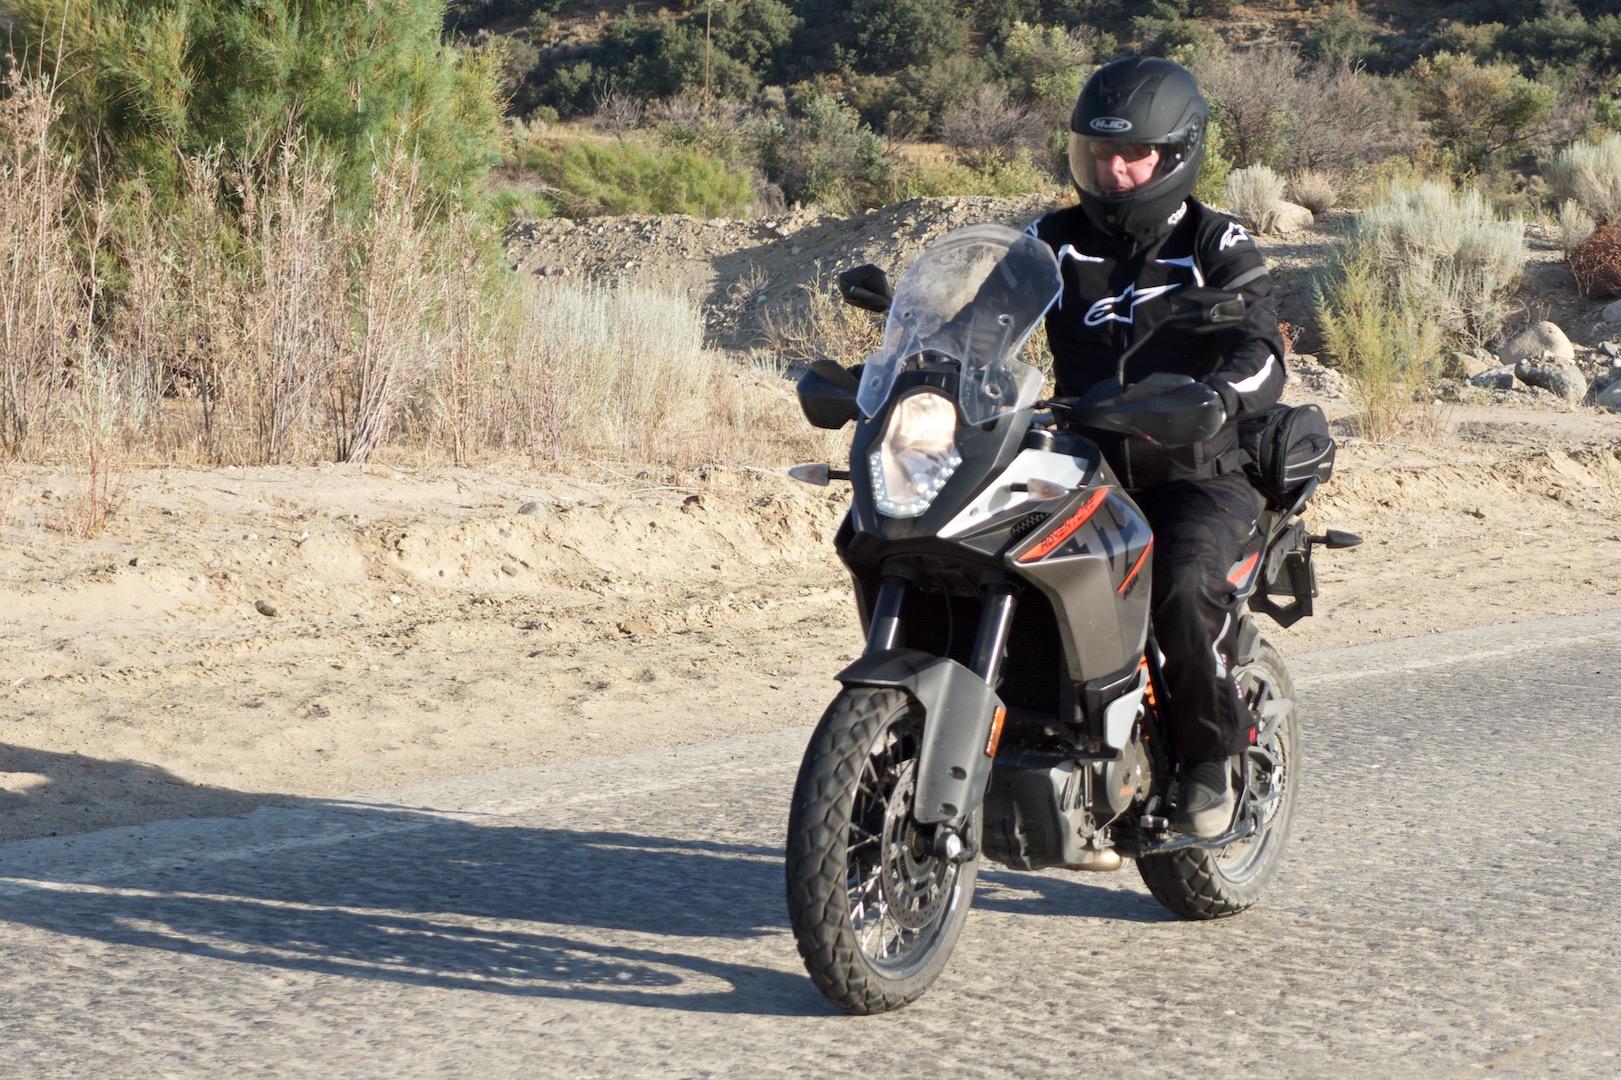 Honda Africa Twin Dct Vs Ktm 1190 Adventure Comparison